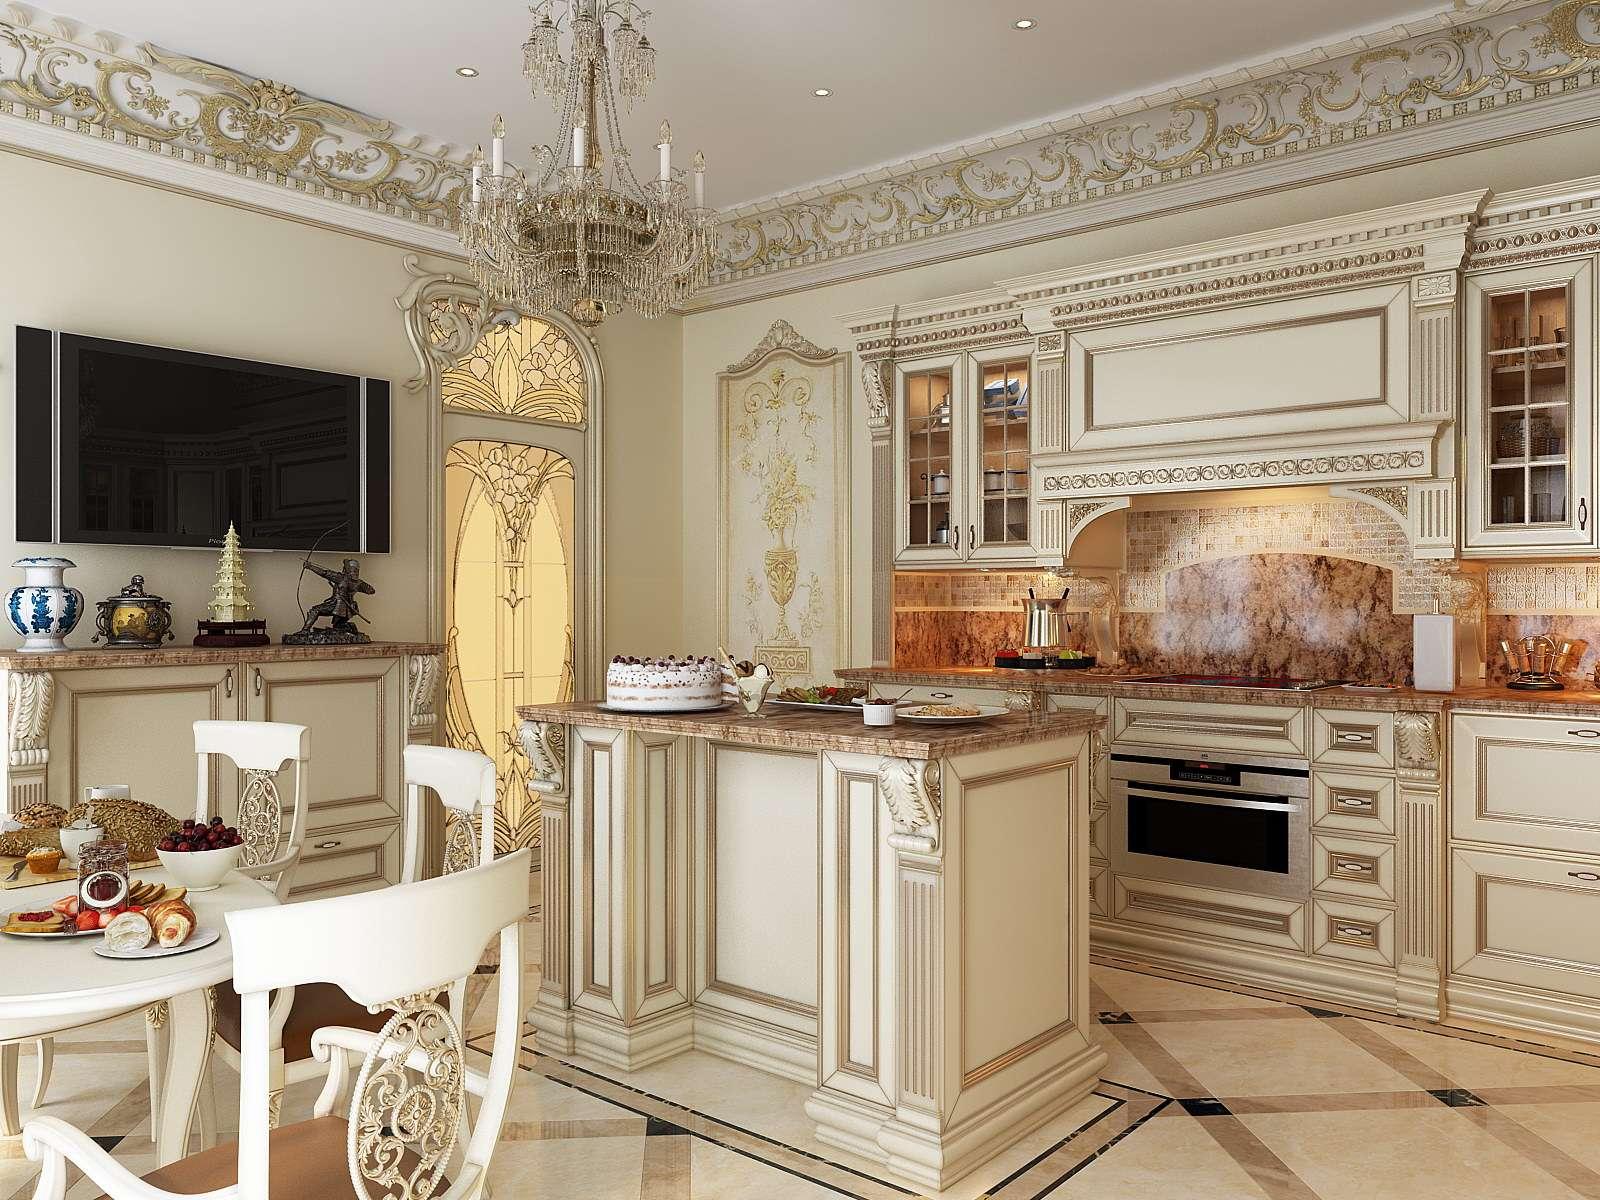 материалы классического стиля кухни